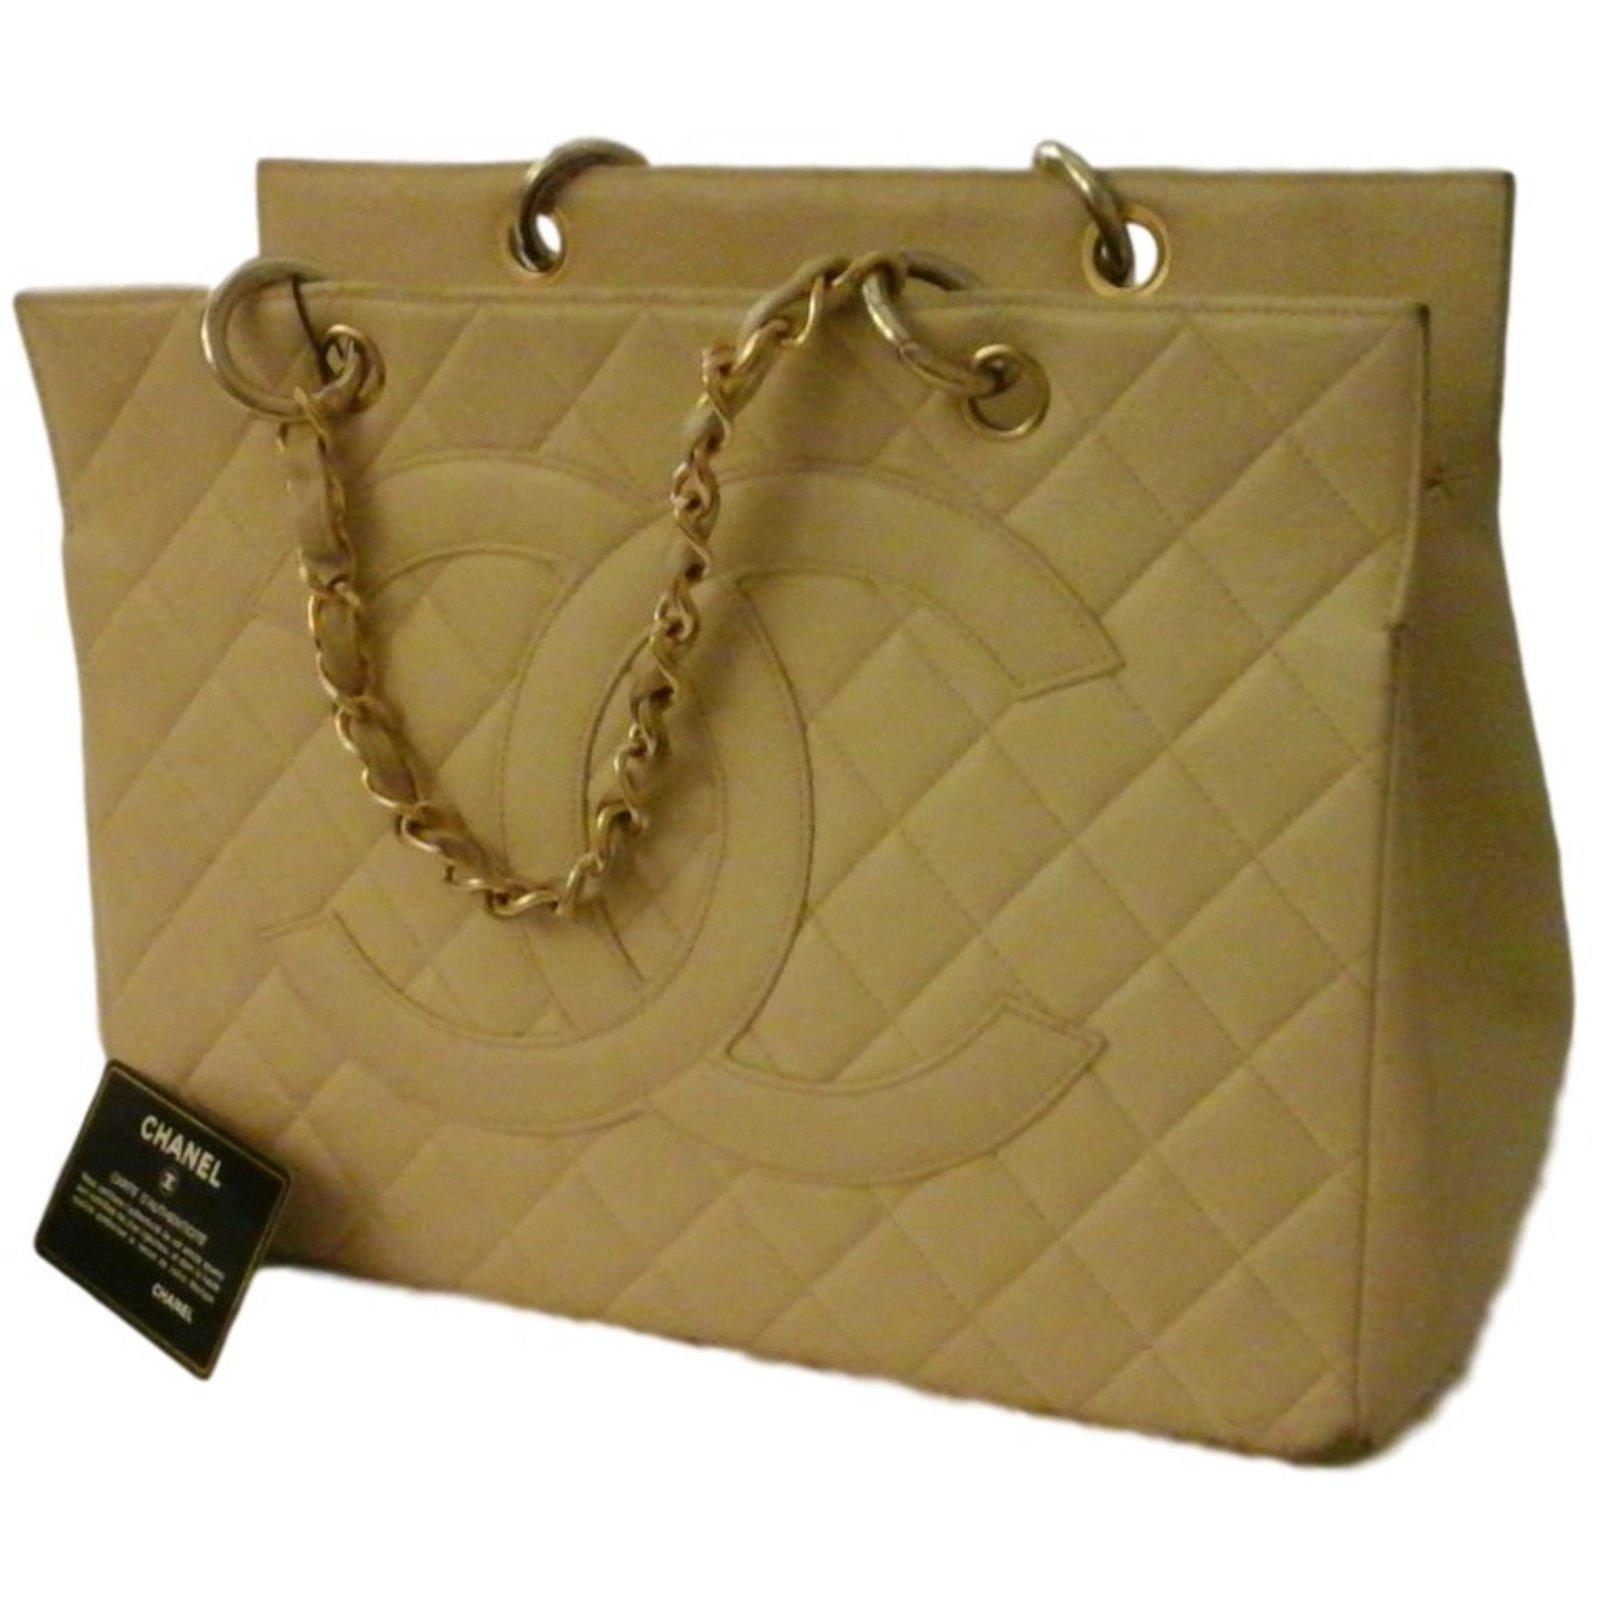 Chanel Handbag Handbags Leather Cream Ref 24375